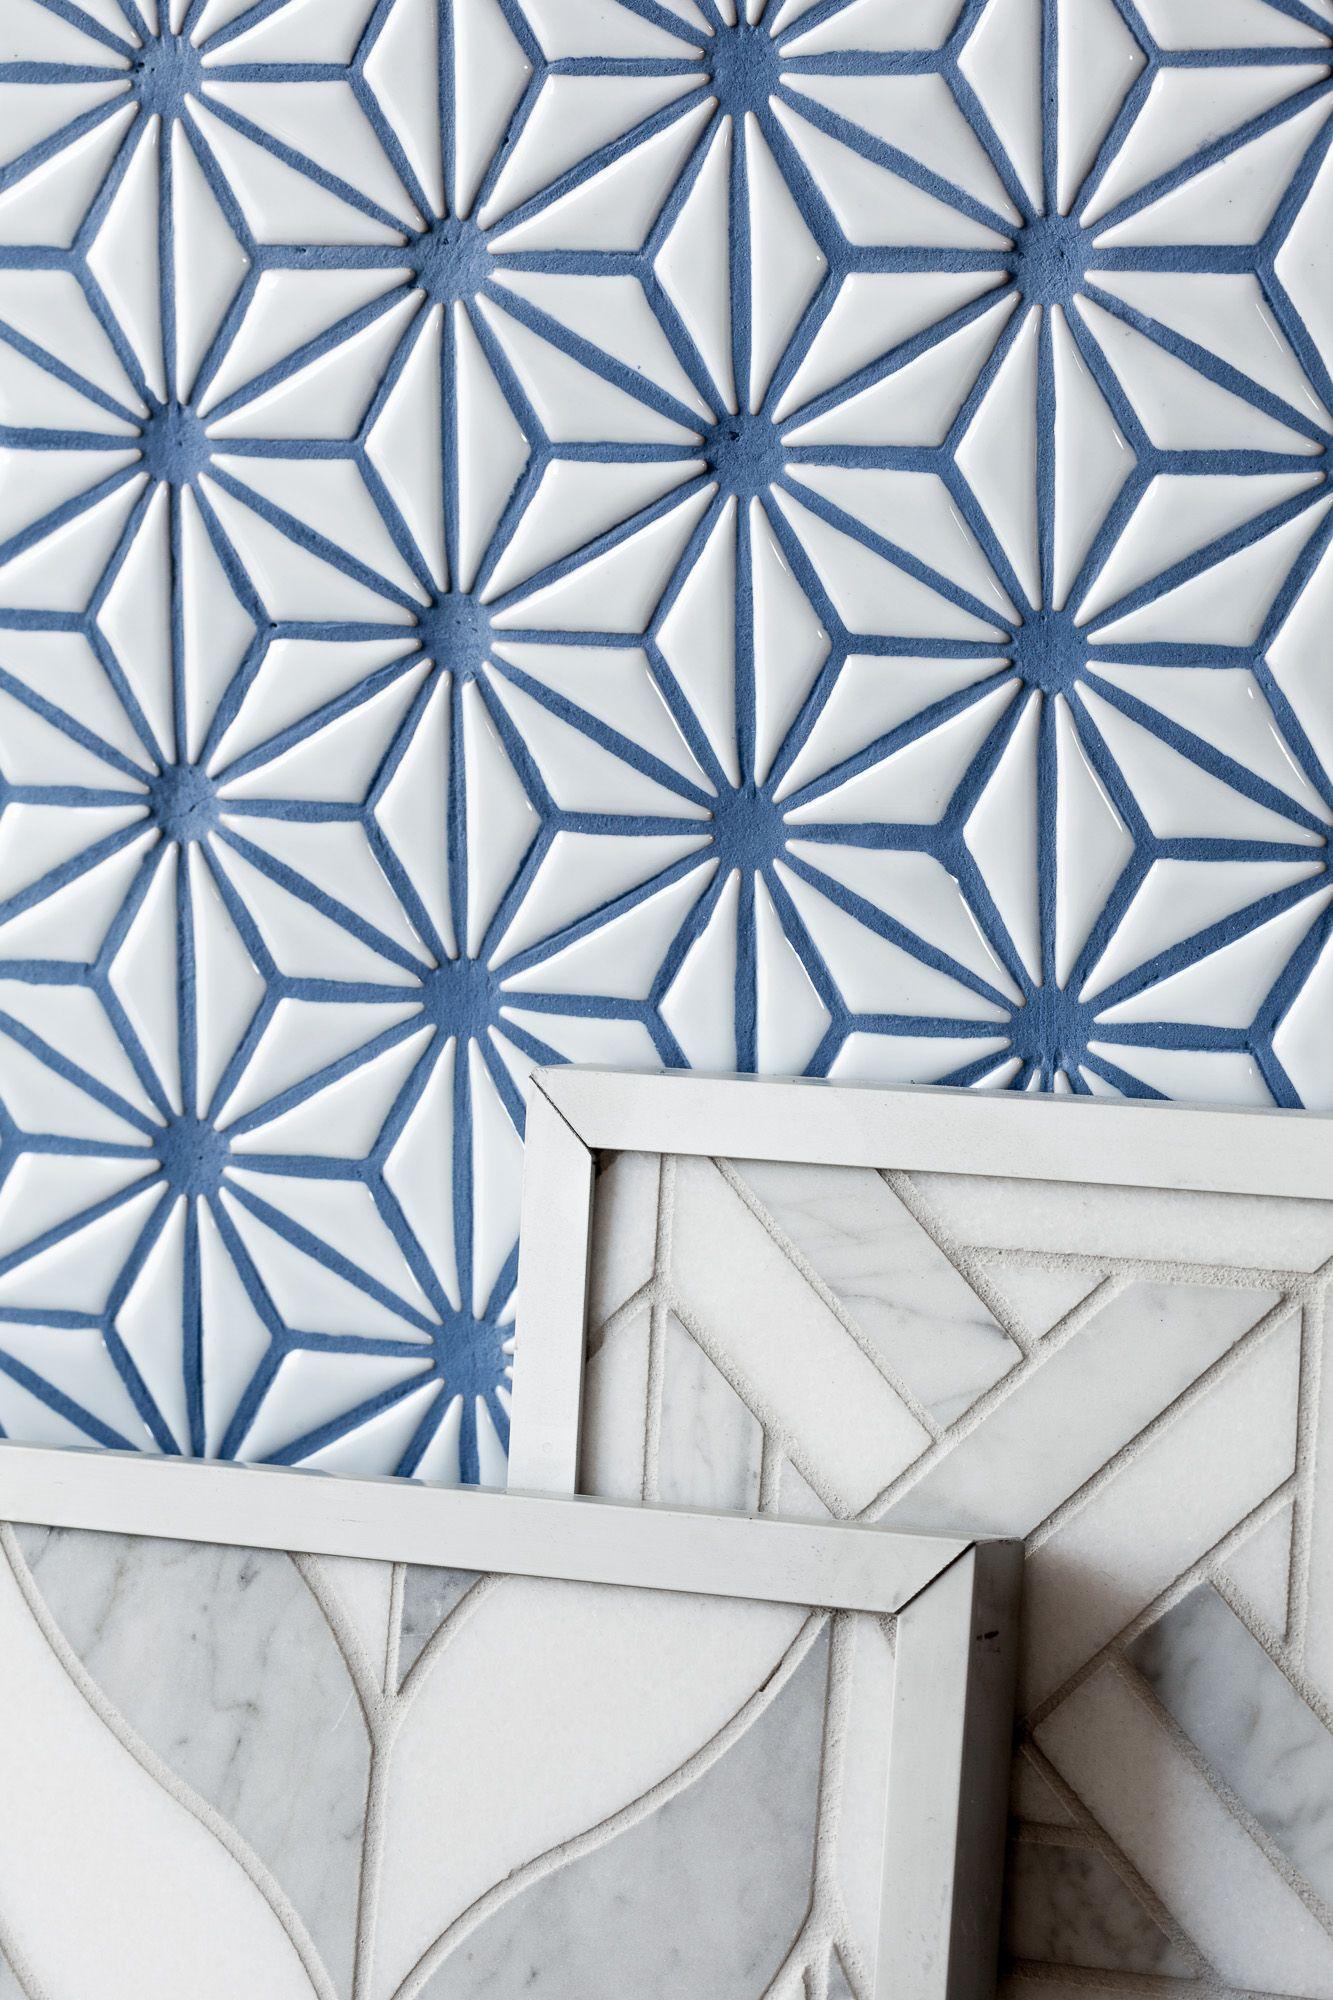 Starburst Mosaic With Blue Grout Byzantine Design Gallery